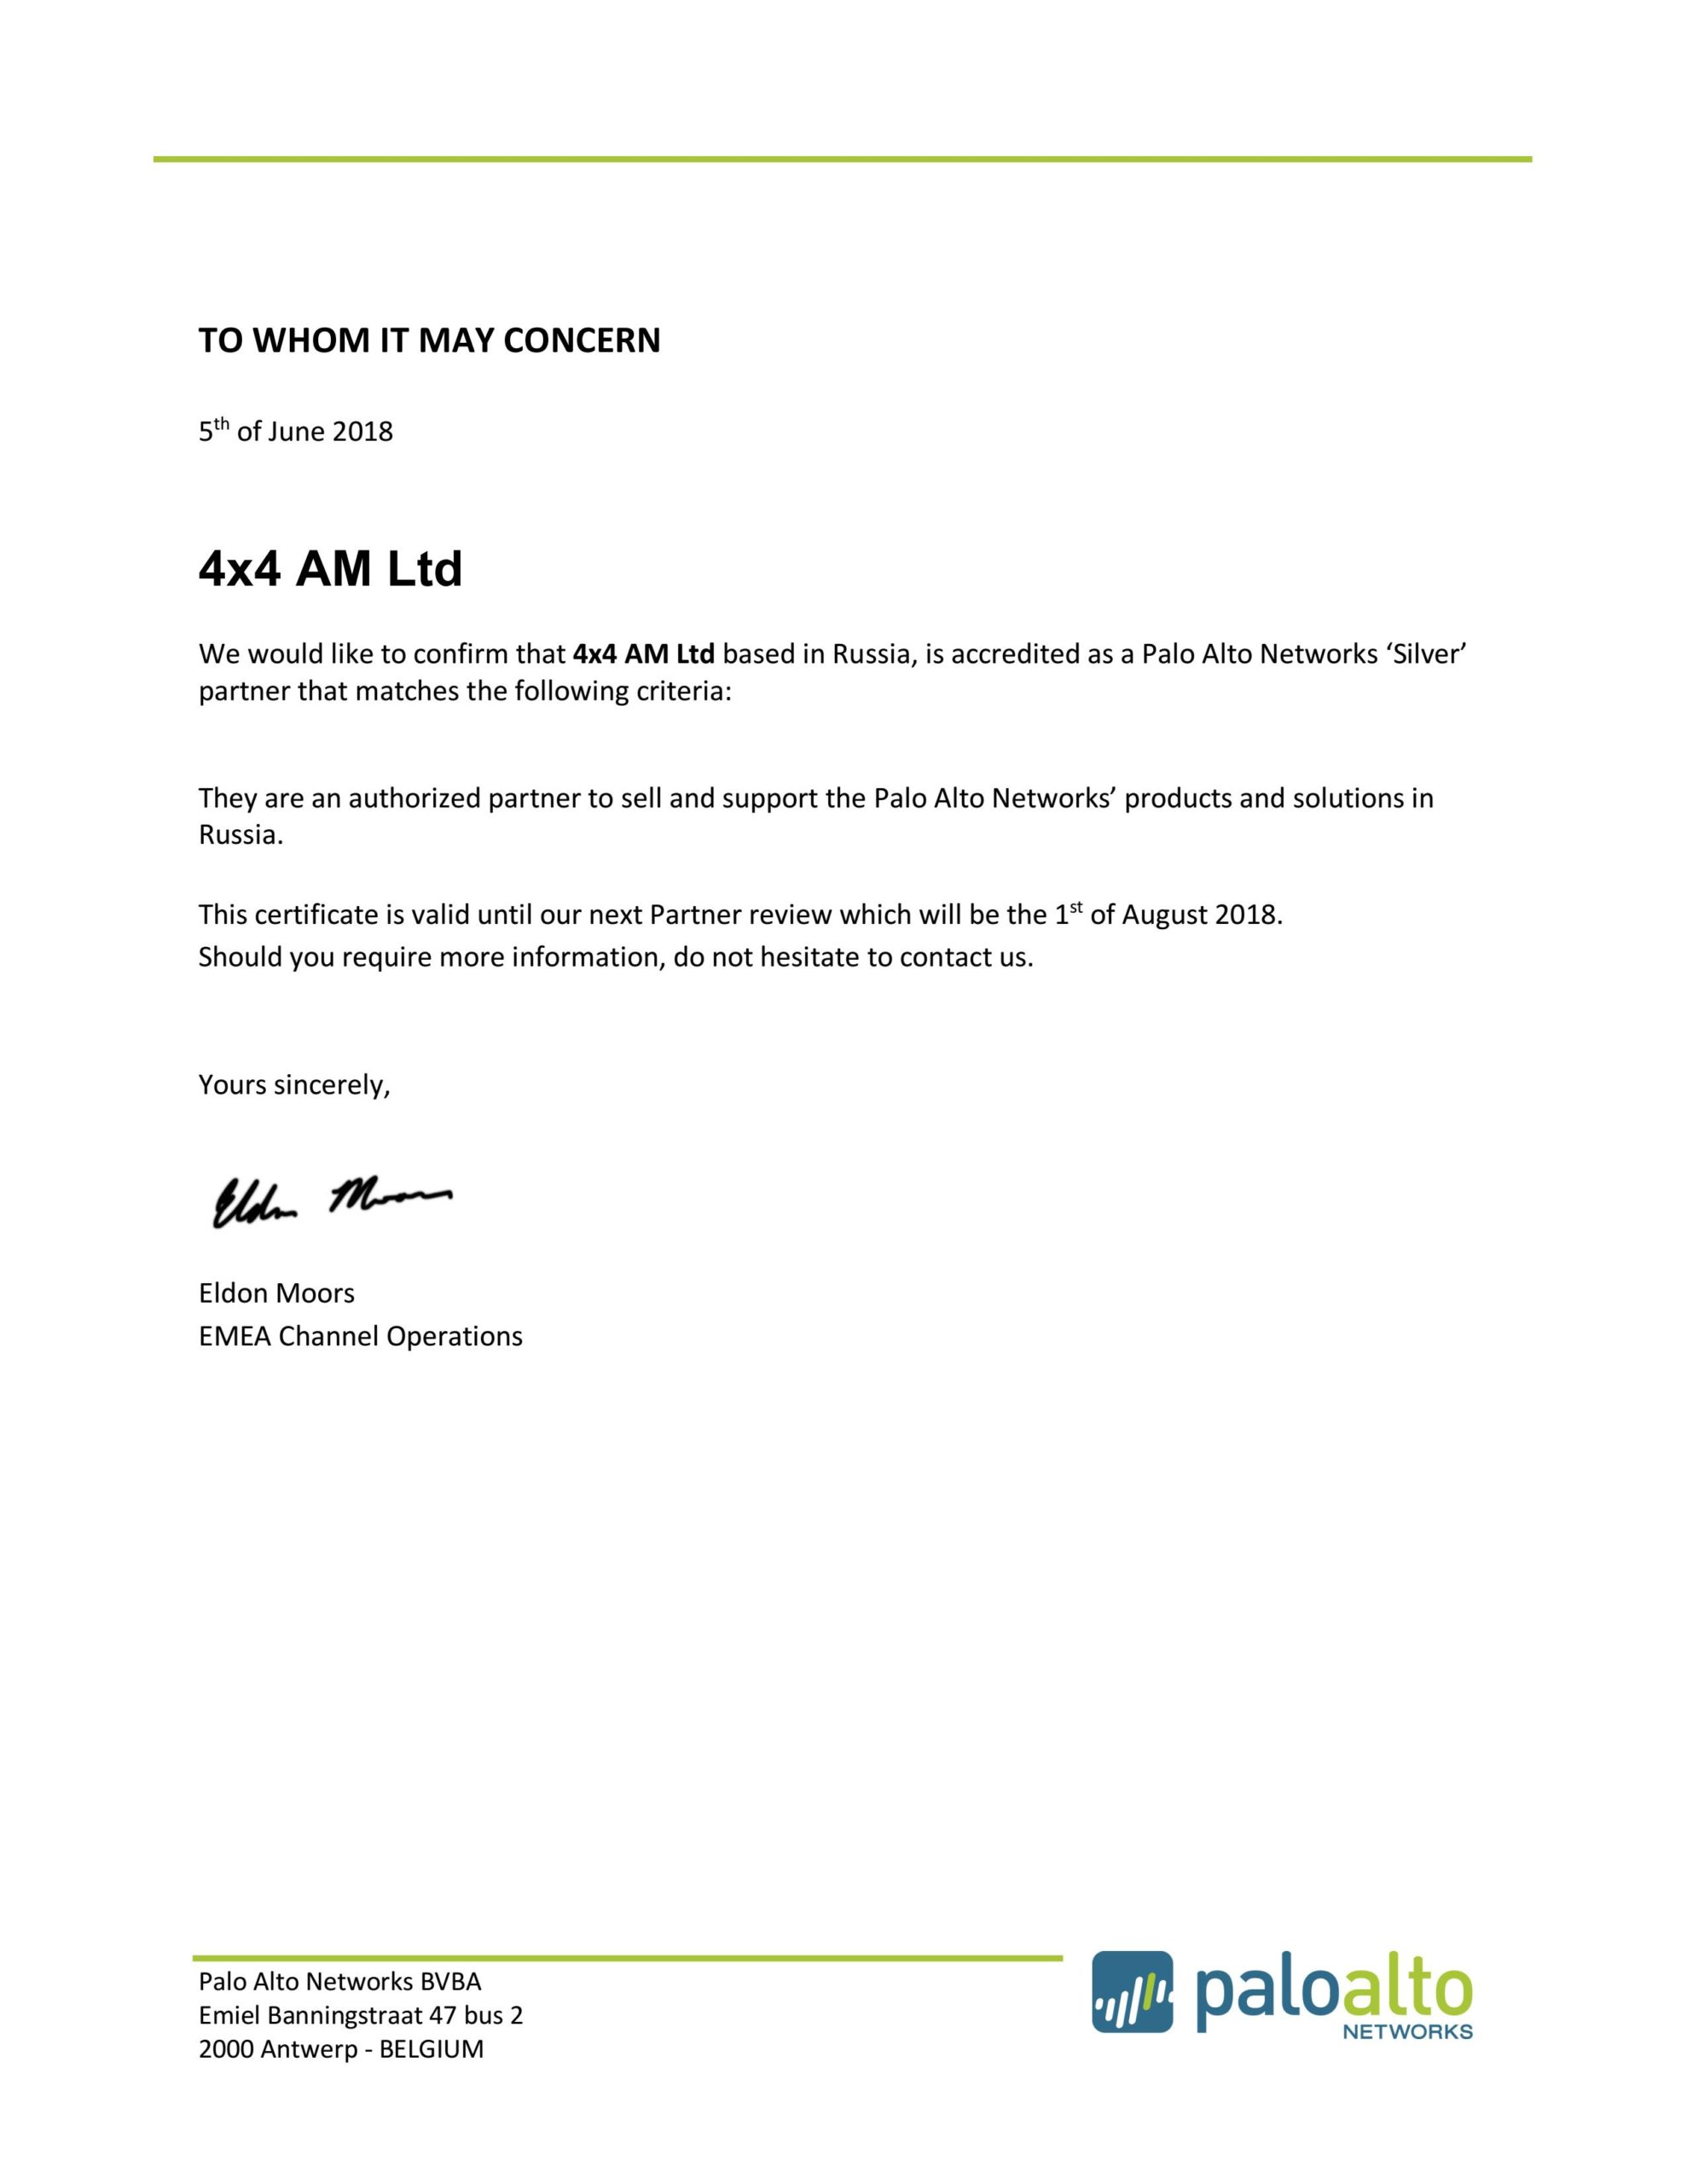 Certificate 4x4 Palo Alto Athorization Letter Silver Partner 2018